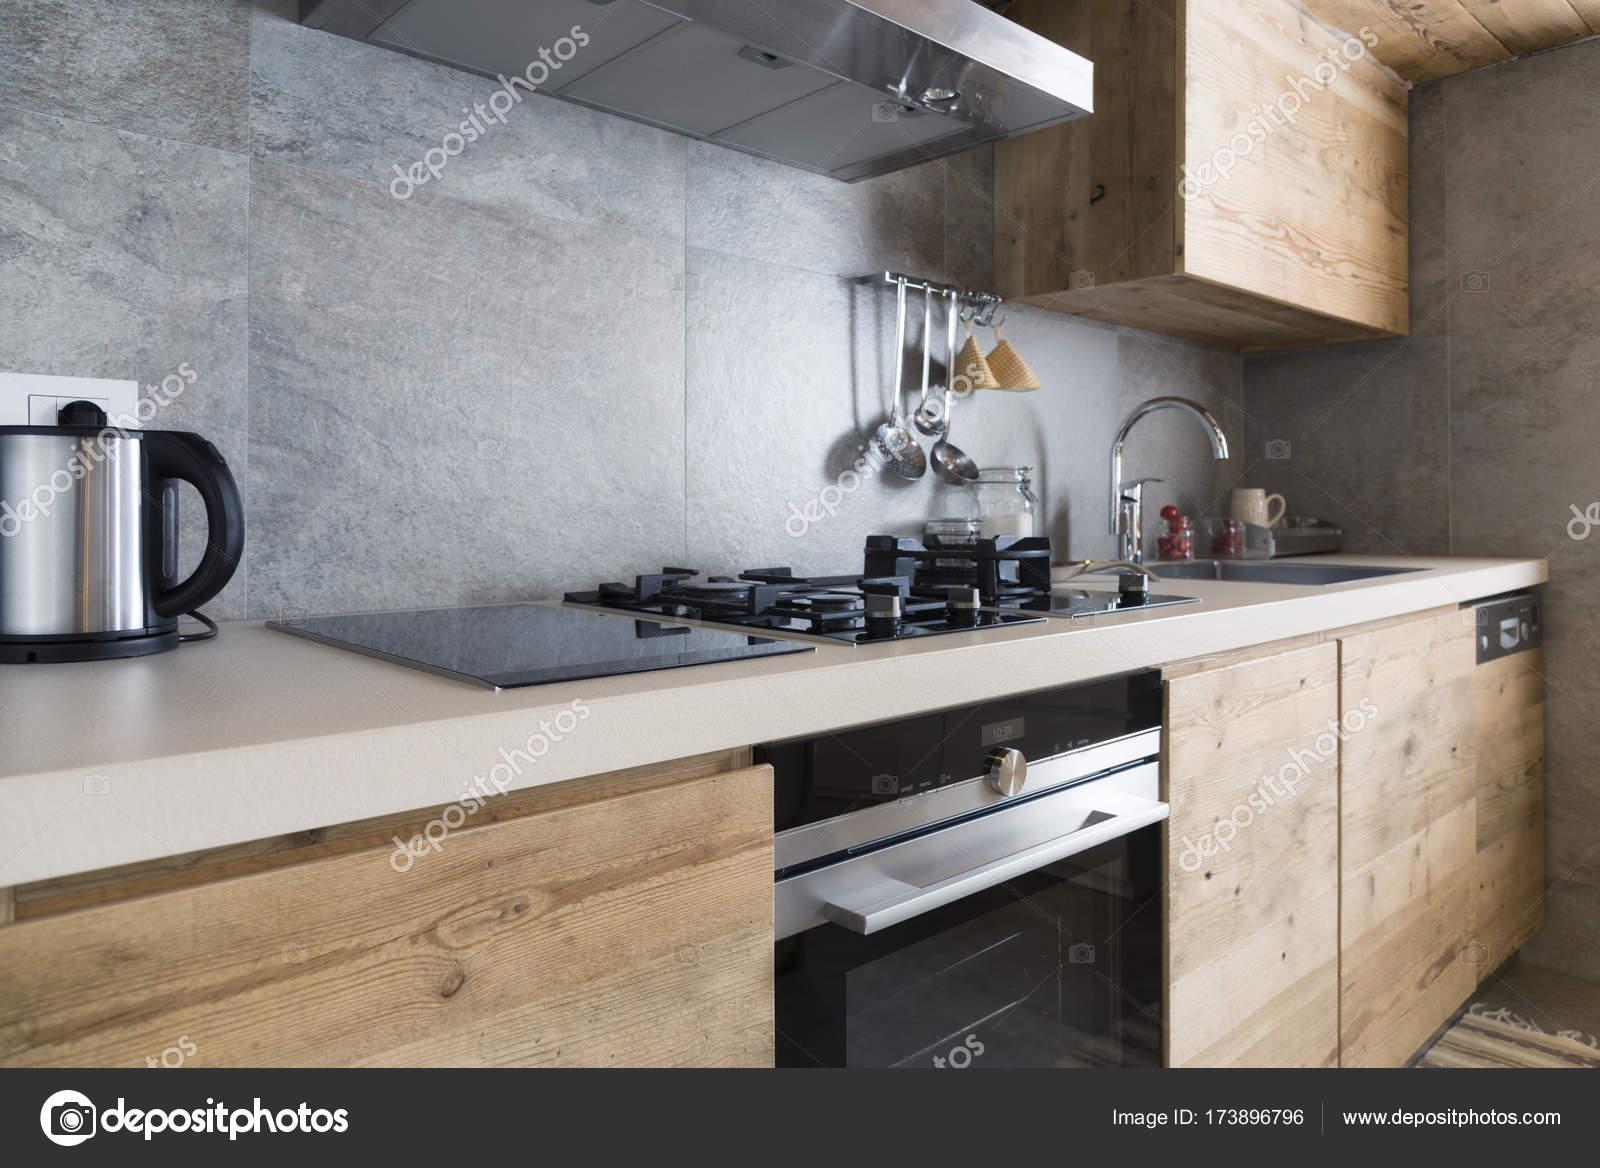 kitchen counters counter table 现代木厨房柜台 图库照片 c ilfede 173896796